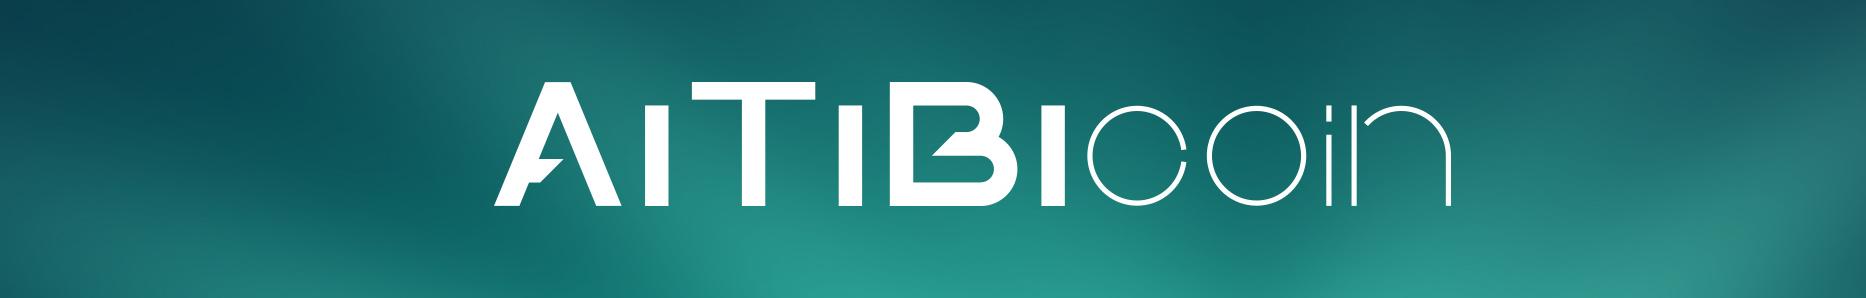 AiTiBi_Coin banner